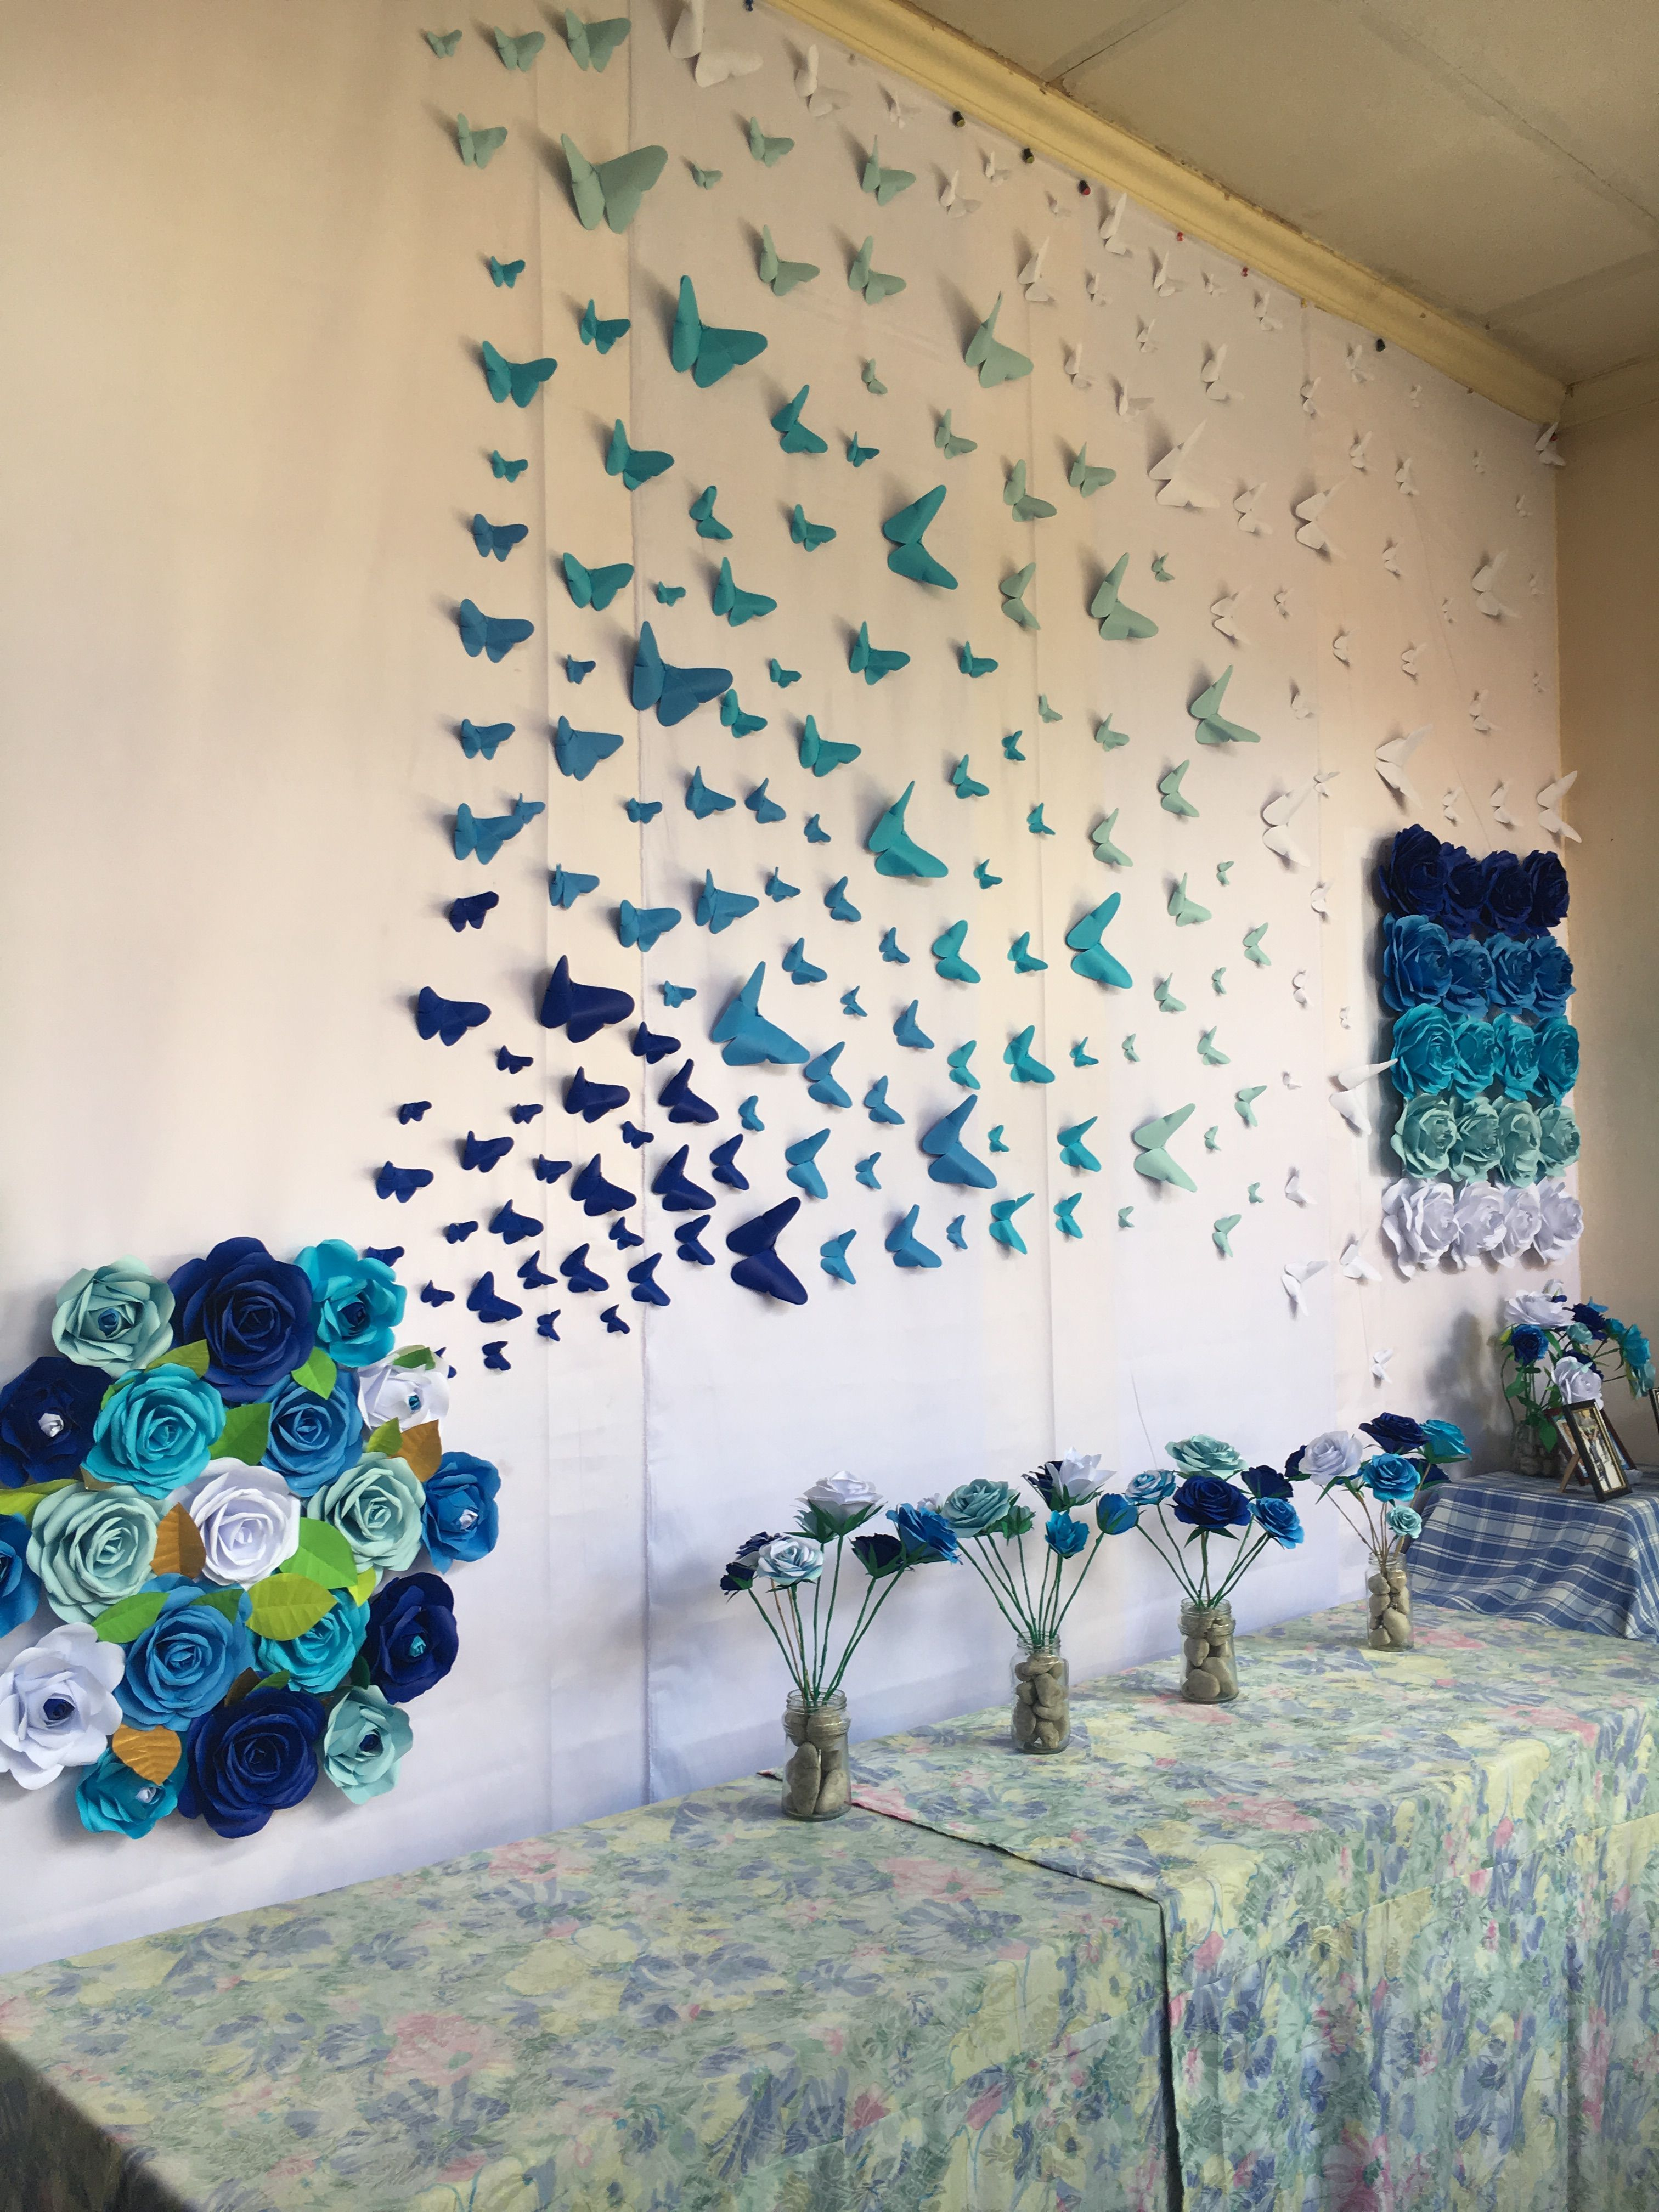 Villa bella chardonnay ceramic wall decor imax salma mercury glass